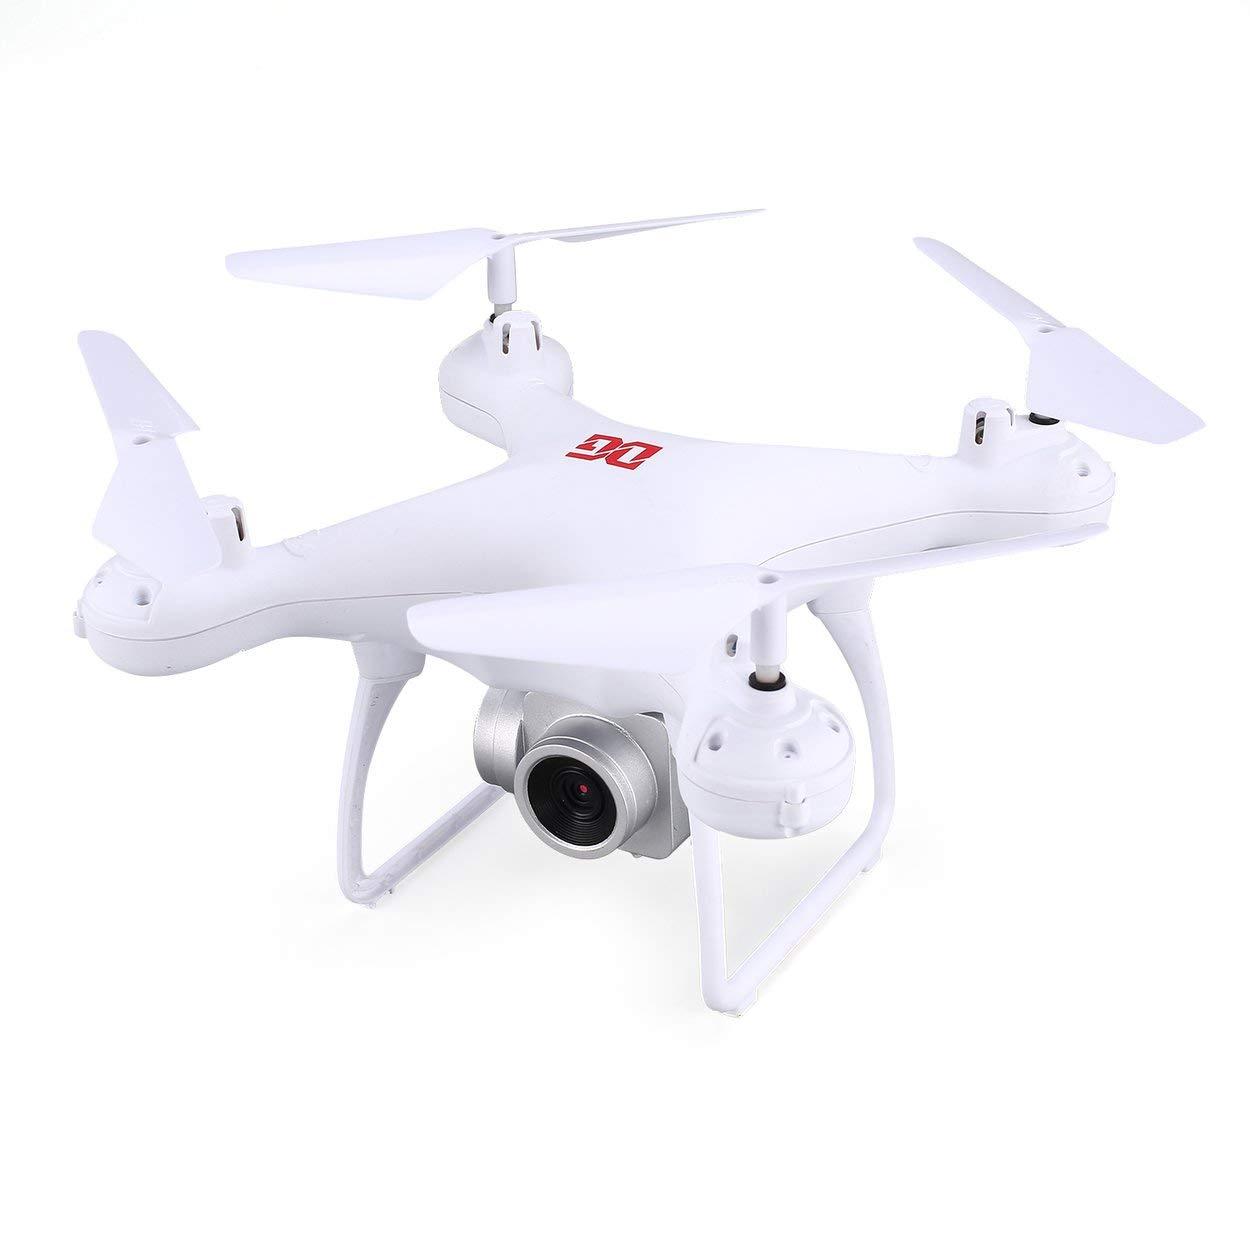 Lorenlli Passen Sie XG183 2.4G RC Selfie Drone FPV Quadcopter mit 720P Kamera Realtime Höhe Hold LED Flash Wort Programmierbare Requisiten